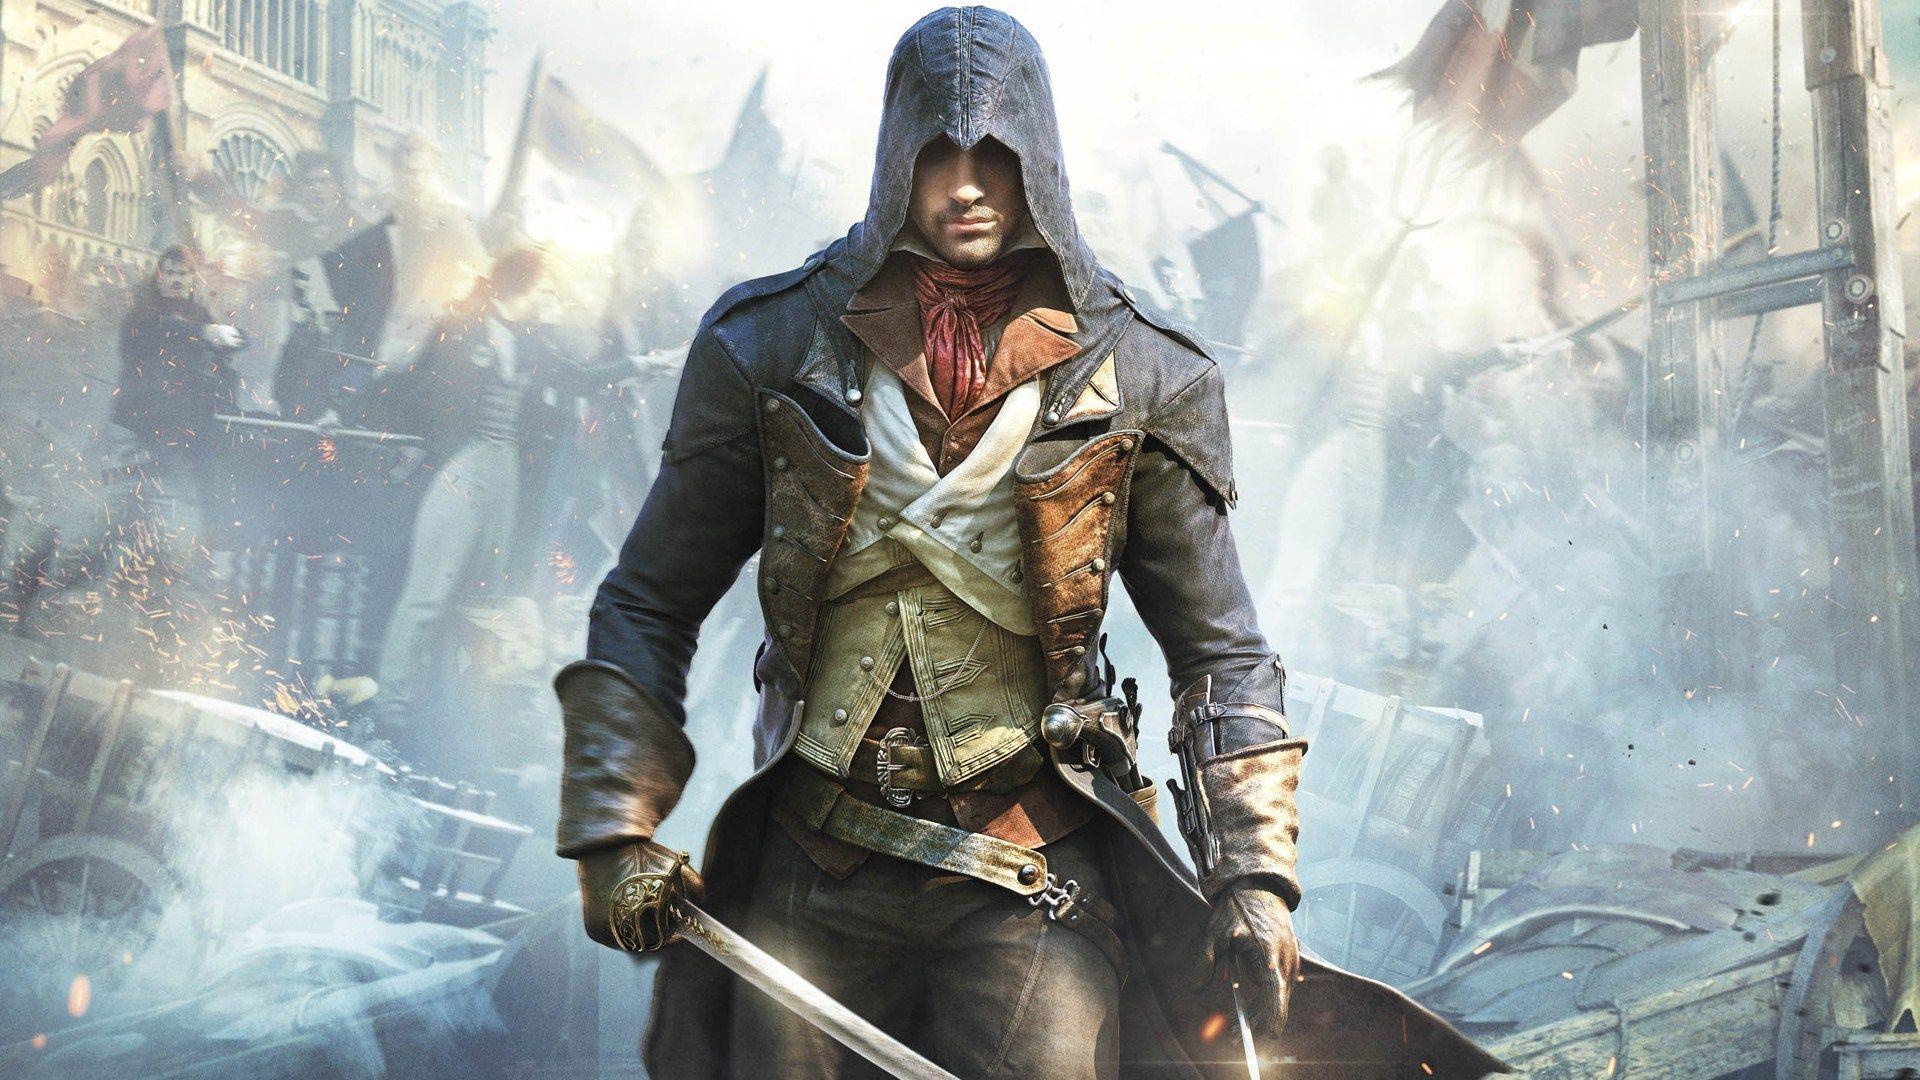 1920x1080 Assassins Creed Unity Game Wallpaper Assassins Creed